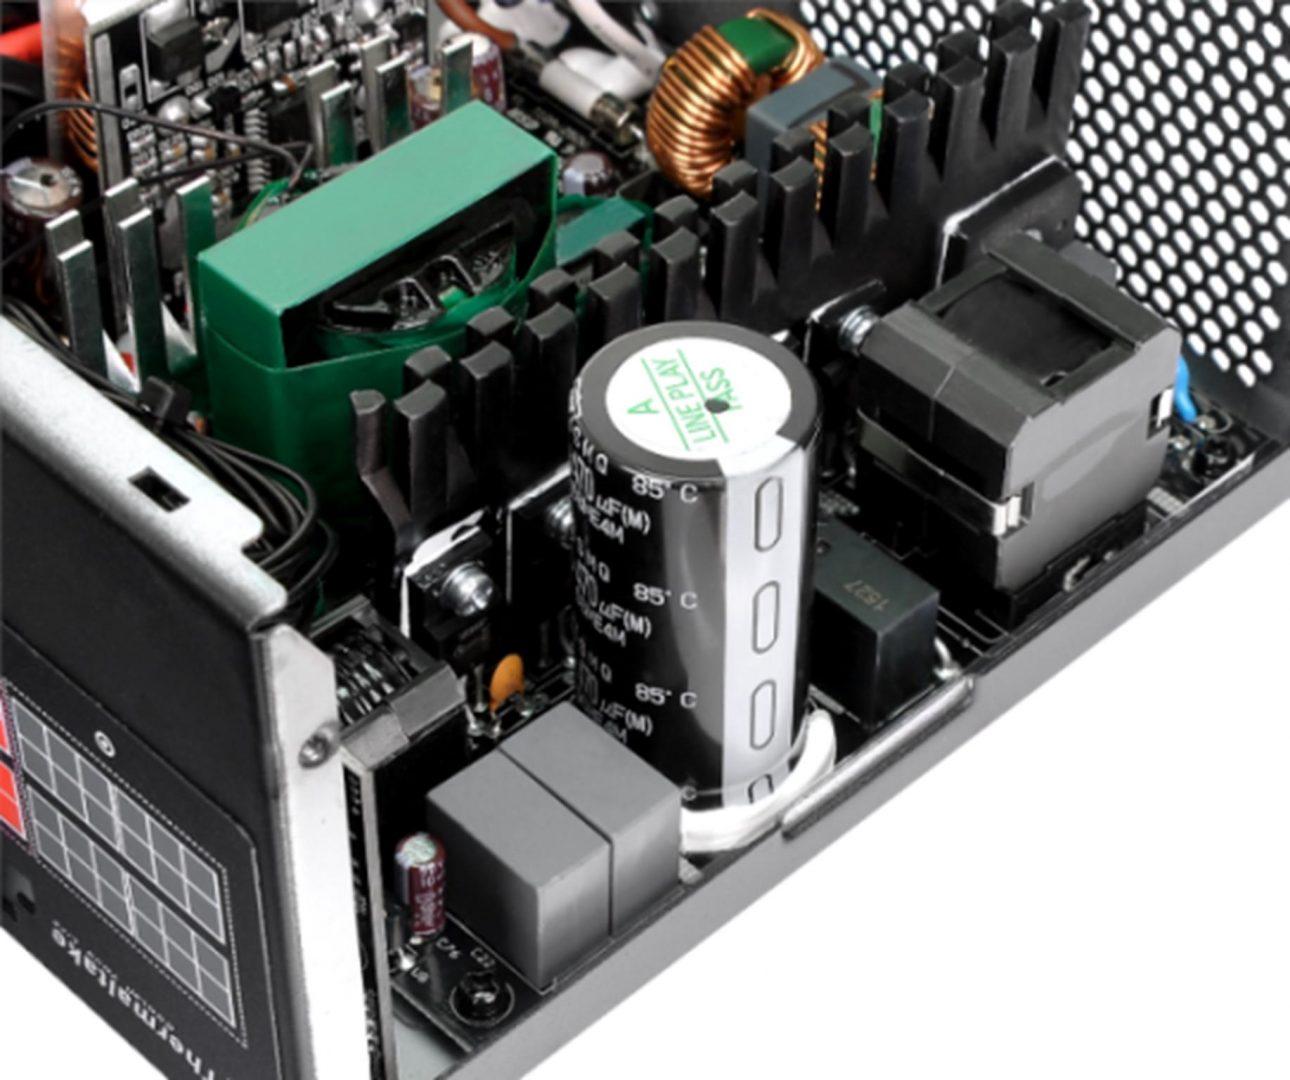 Thermaltake Smart DPS G Gold 750W Digital Power Supply-Japanese Capacitors